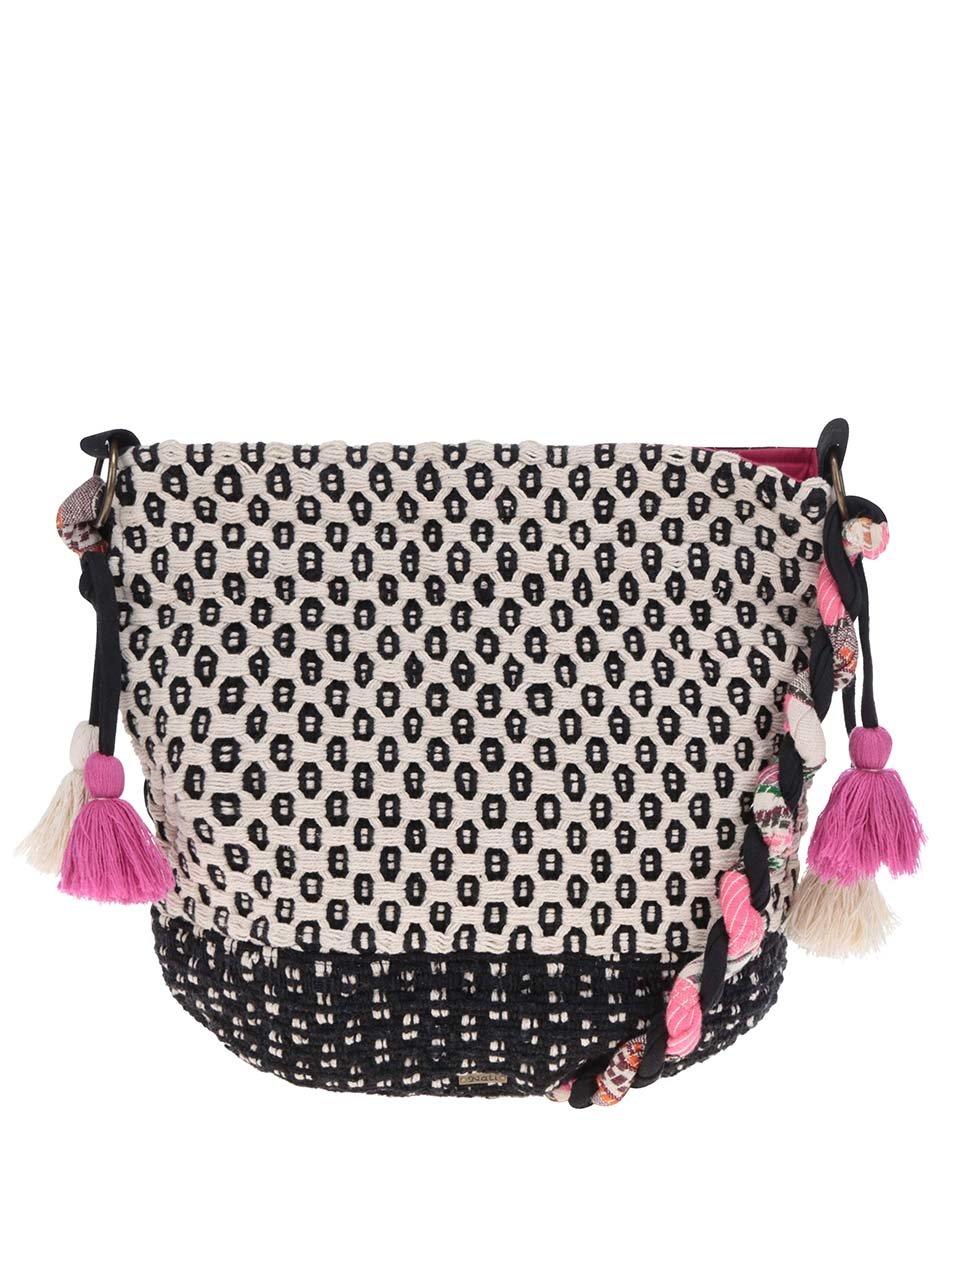 Černo-krémová vzorovaná pletená crossbody kabelka Nalí